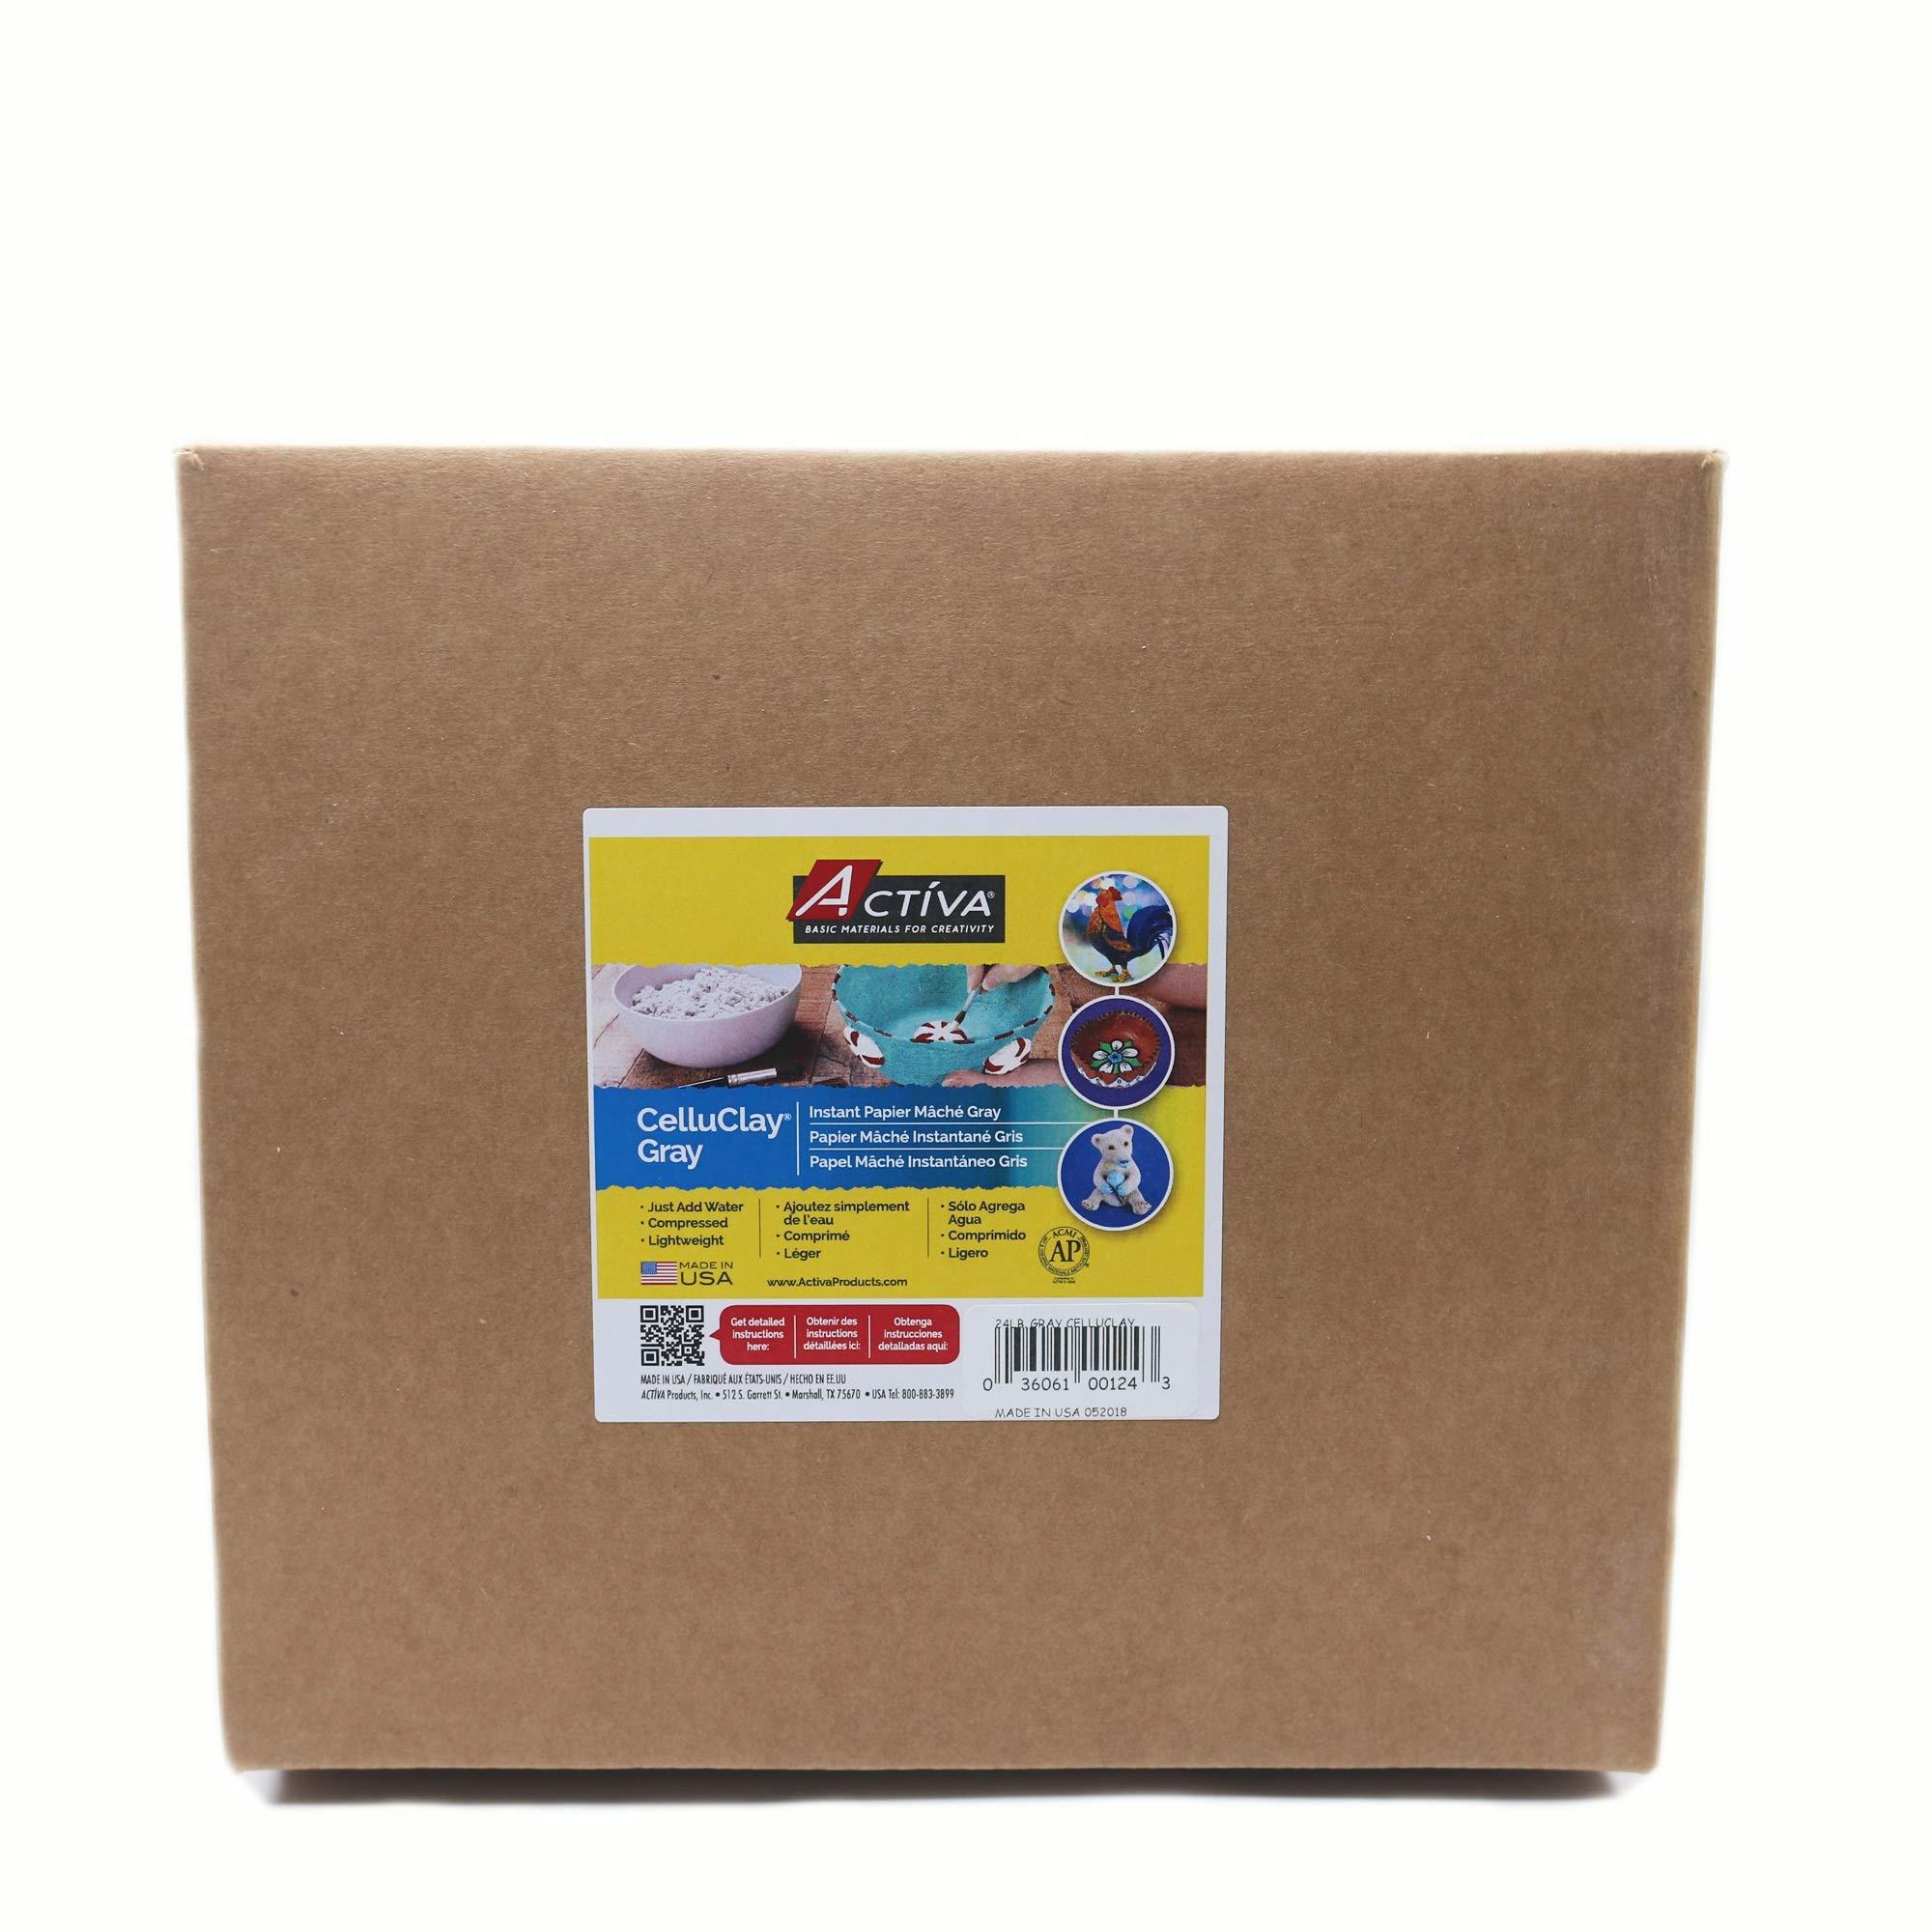 Activa Celluclay Instant Papier-Mache - 24 lbs. - Gray